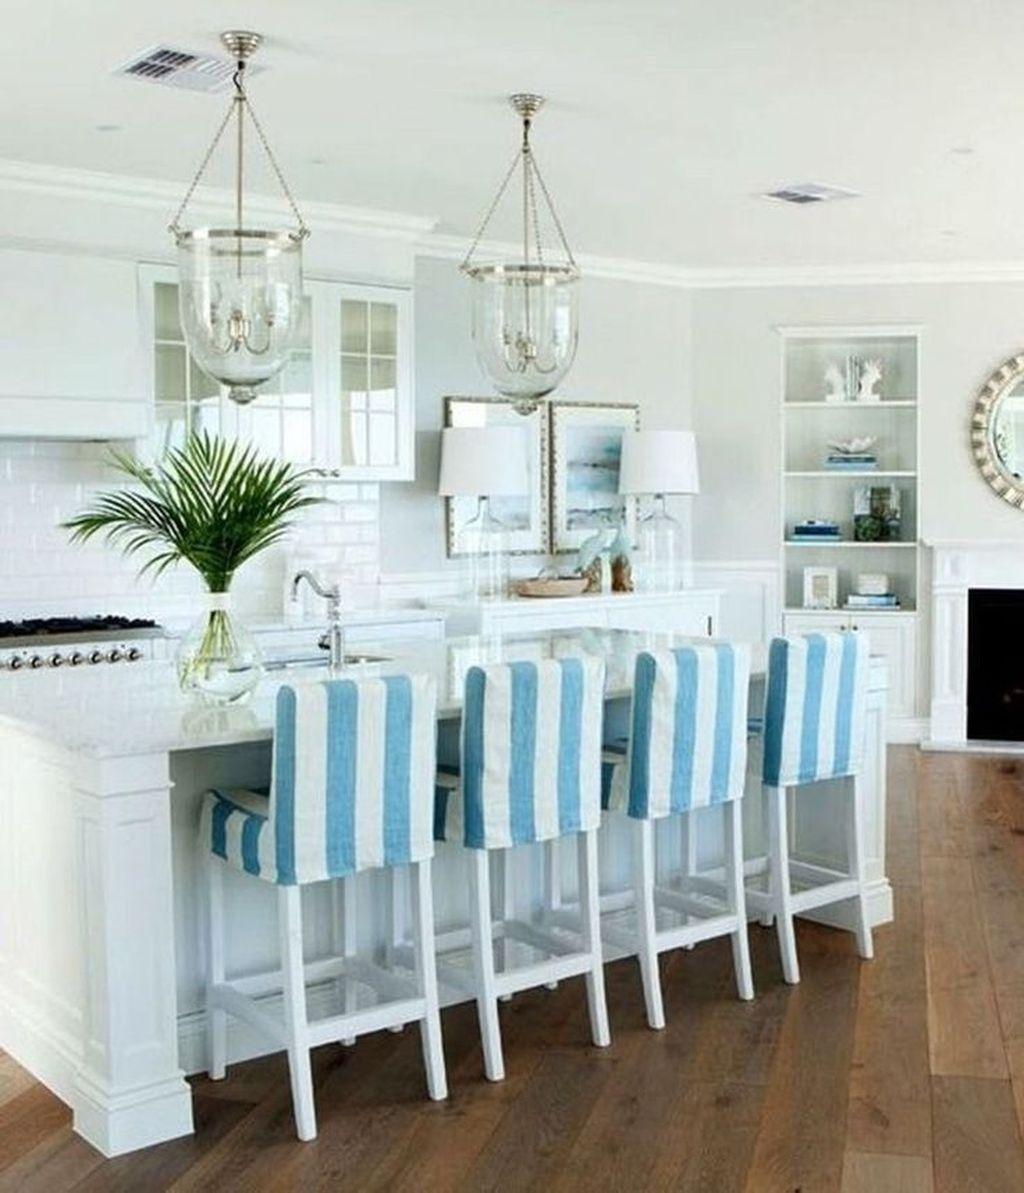 Admirable Beach House Decor Ideas You Should Copy 11